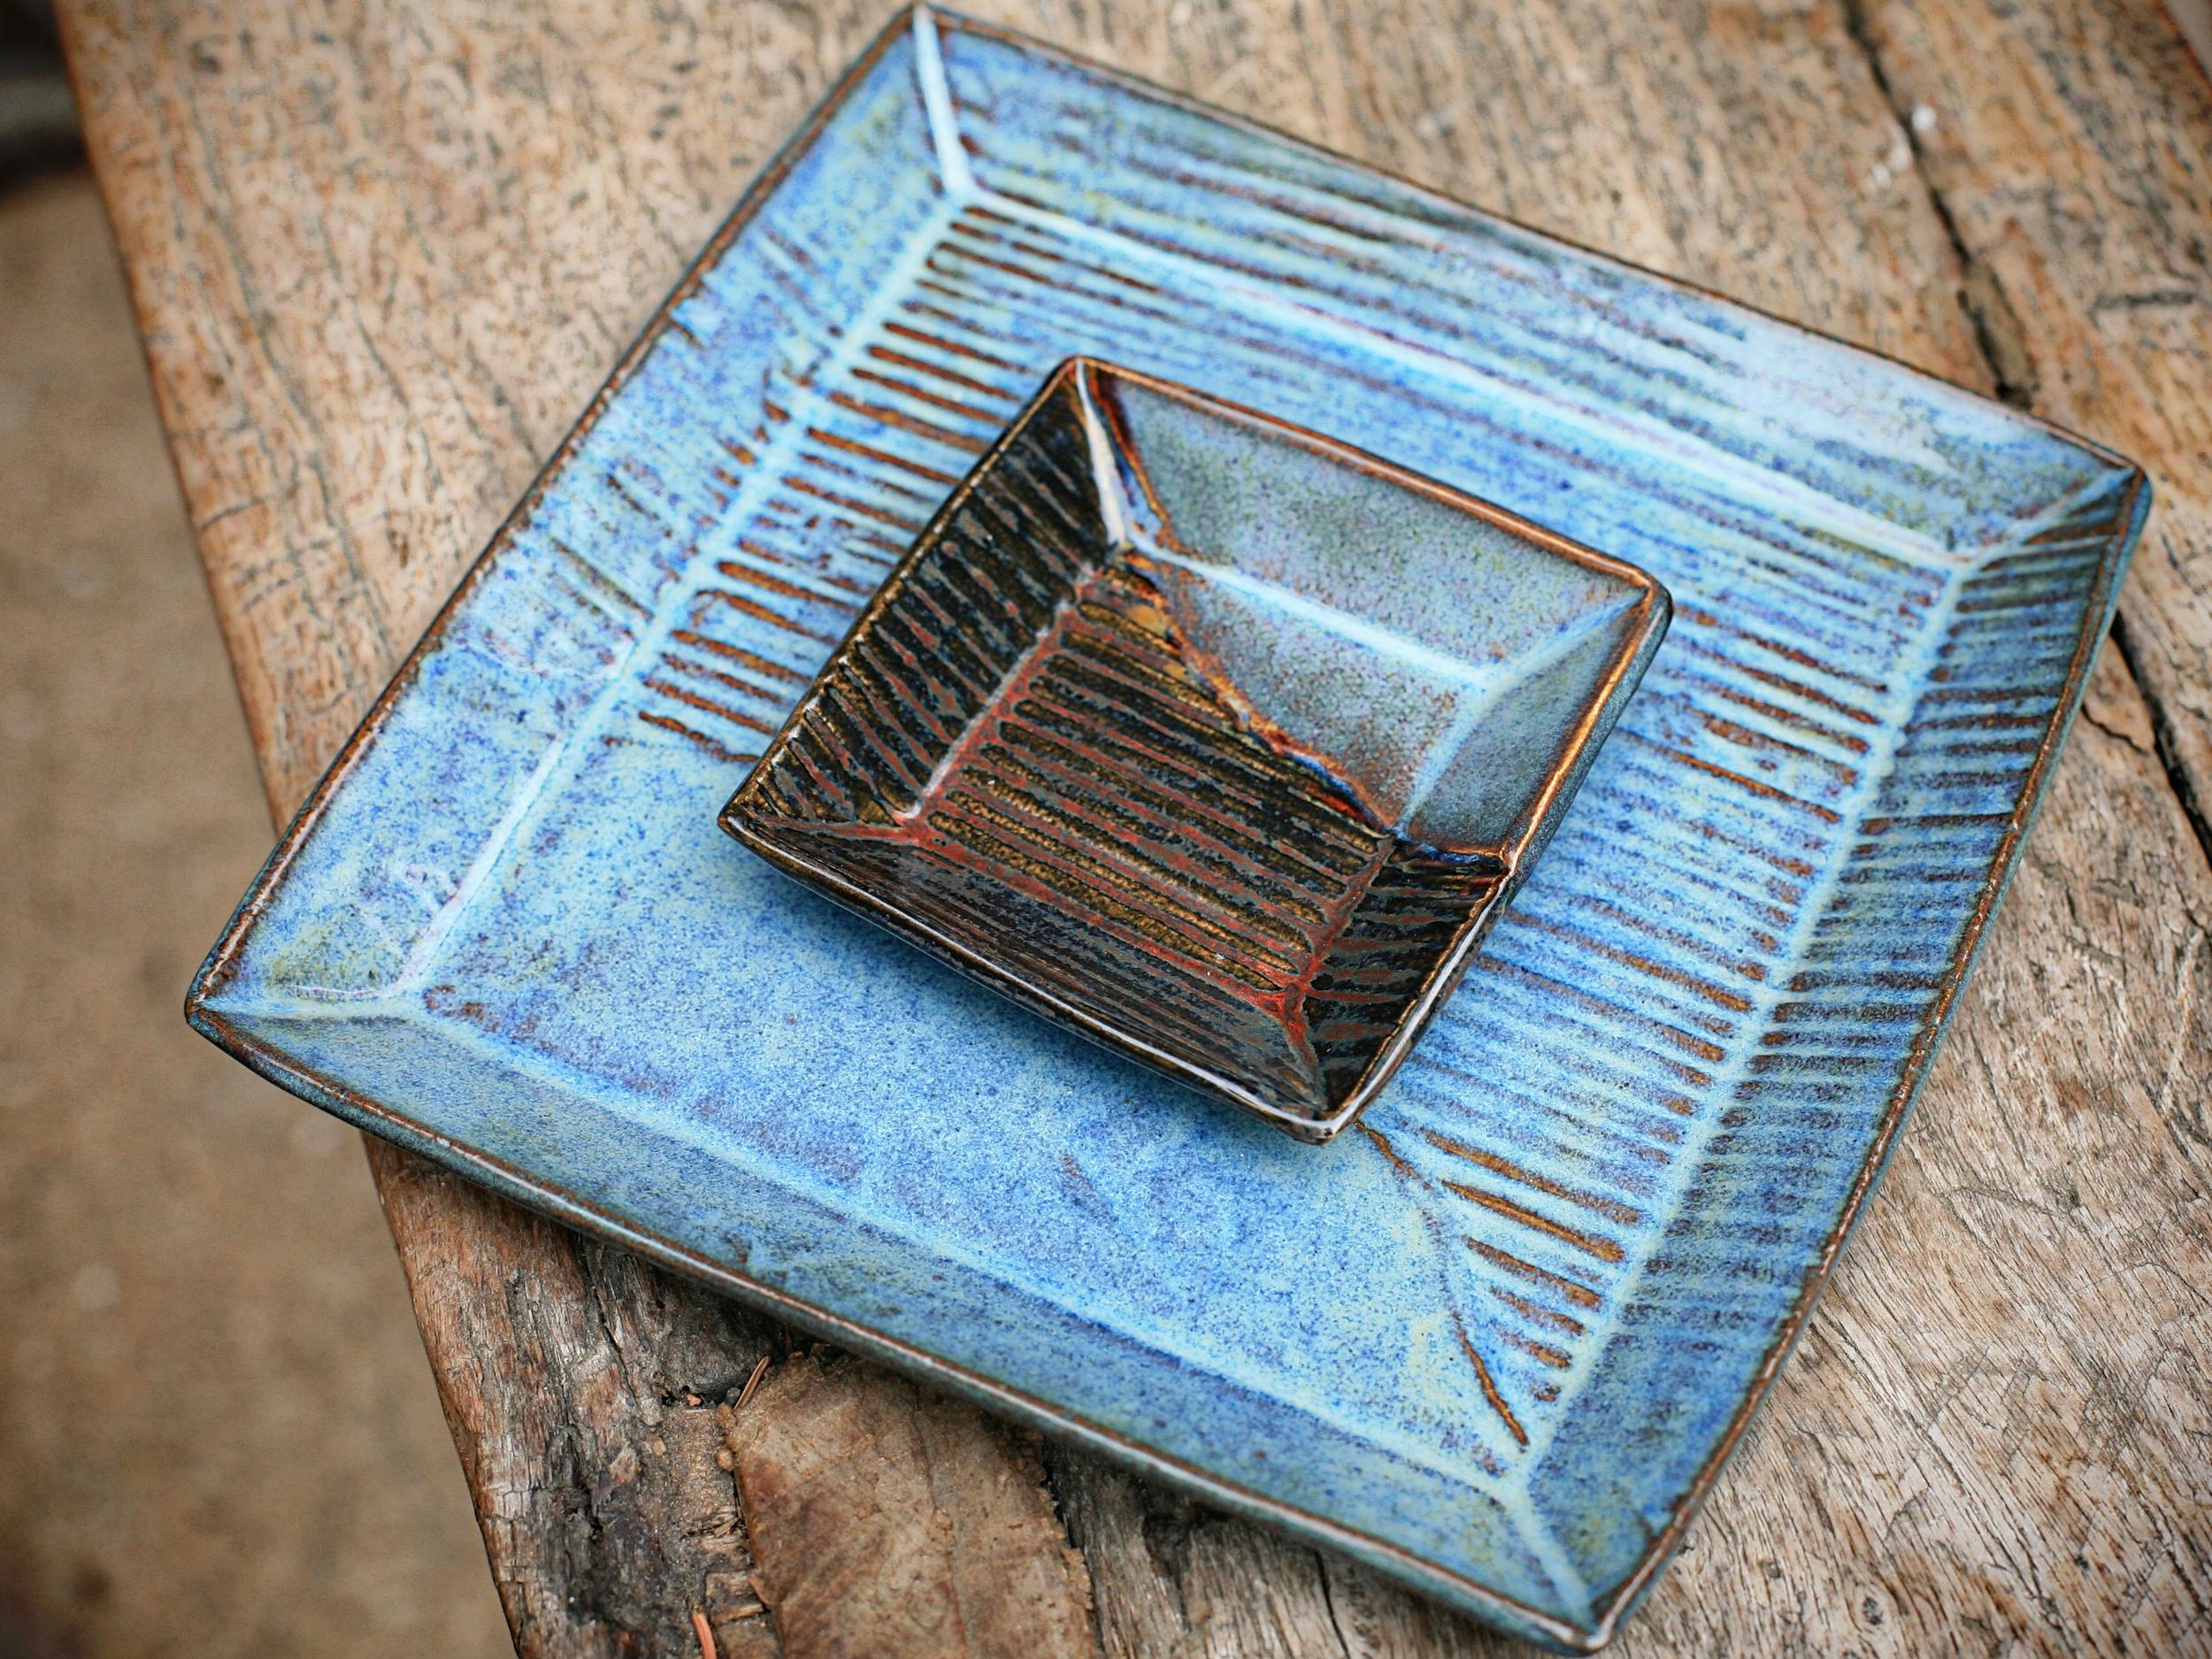 blue plates2.jpg